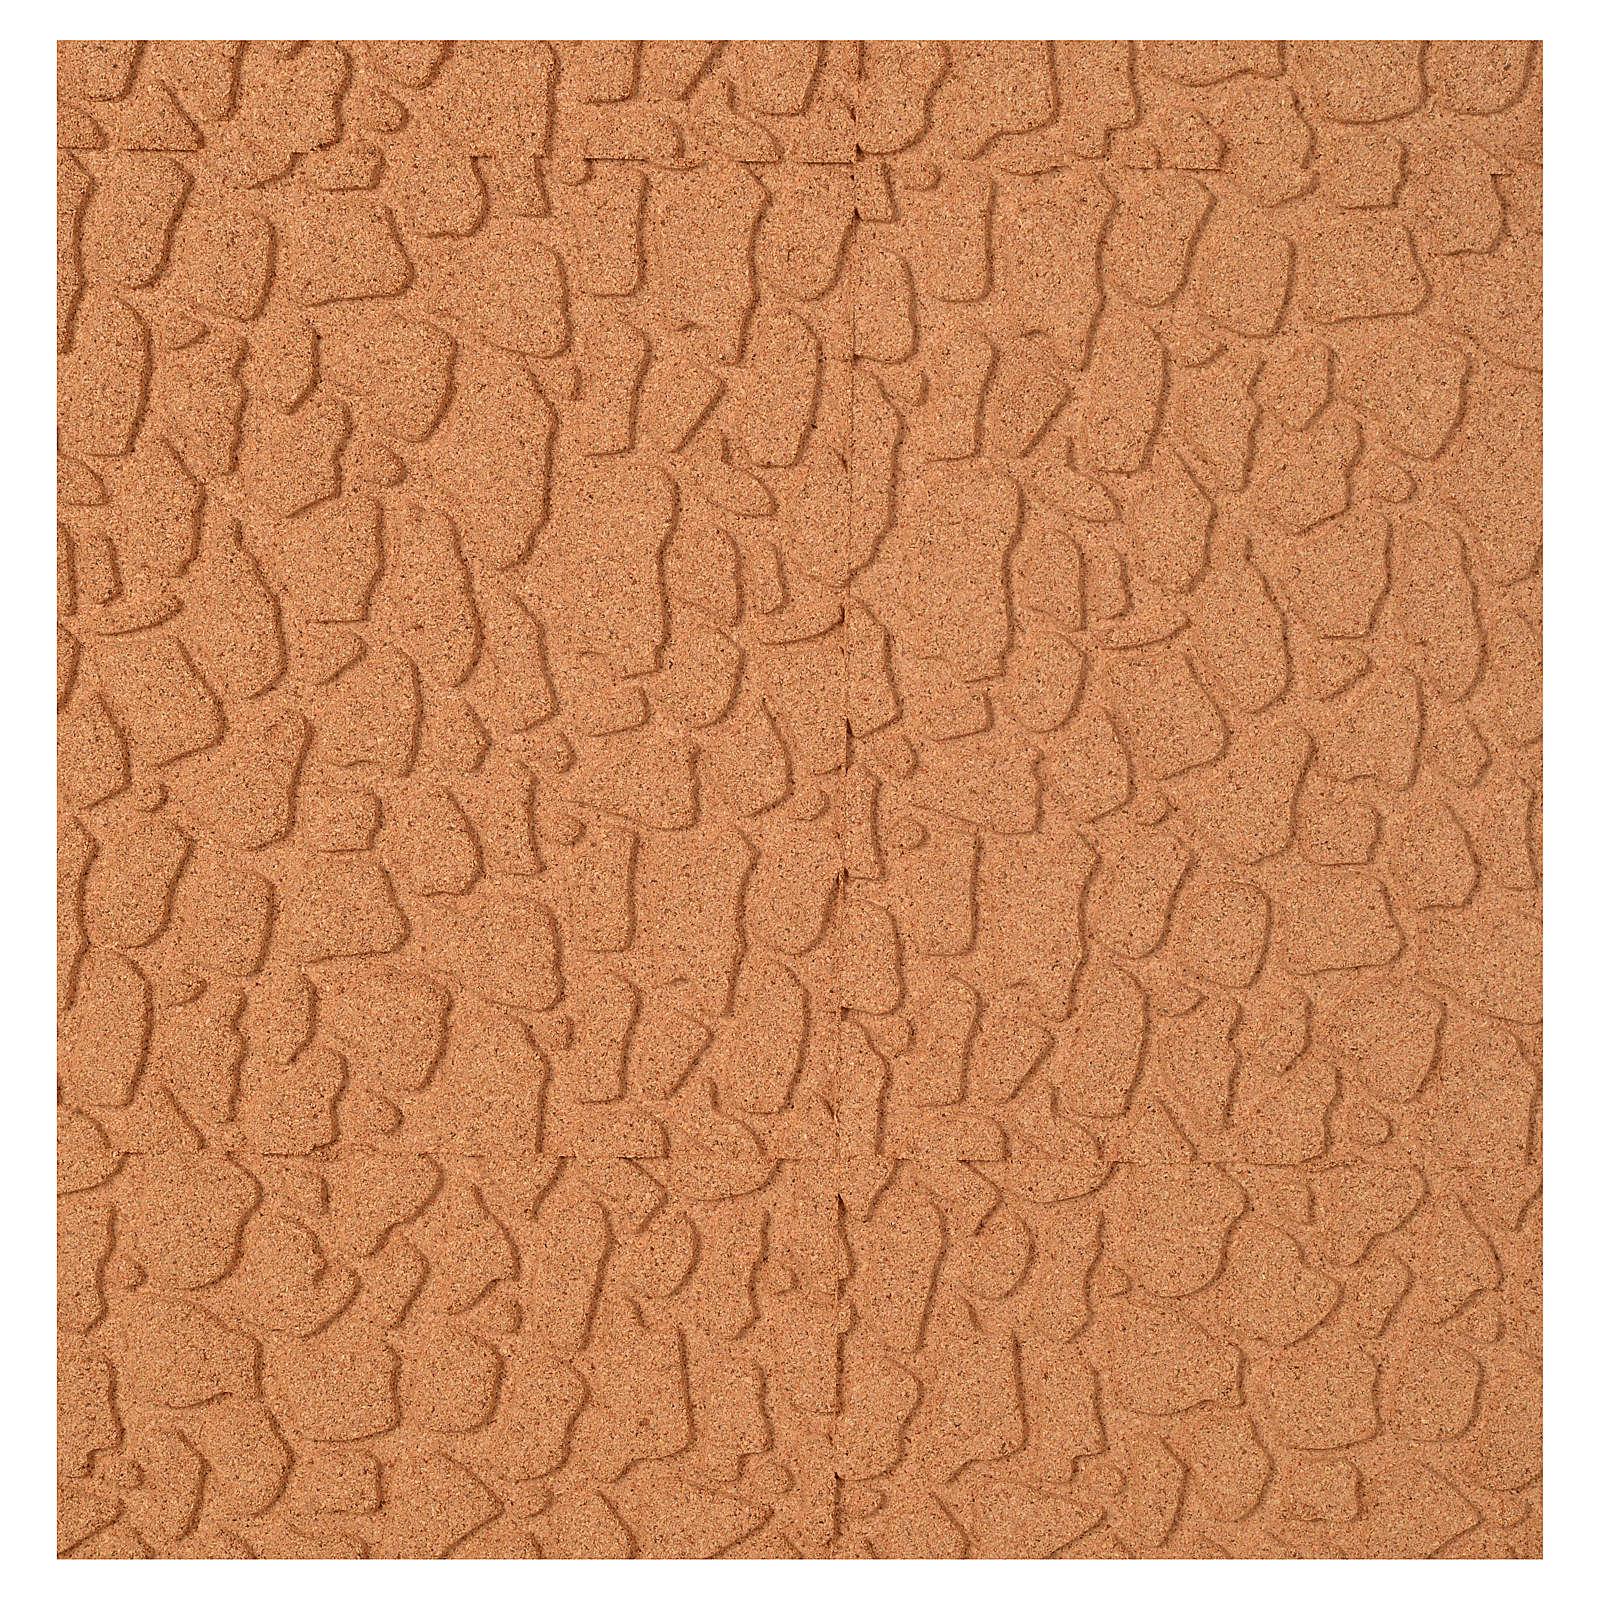 Panneau liège imitation mur en pierre cm 100x50x1 4